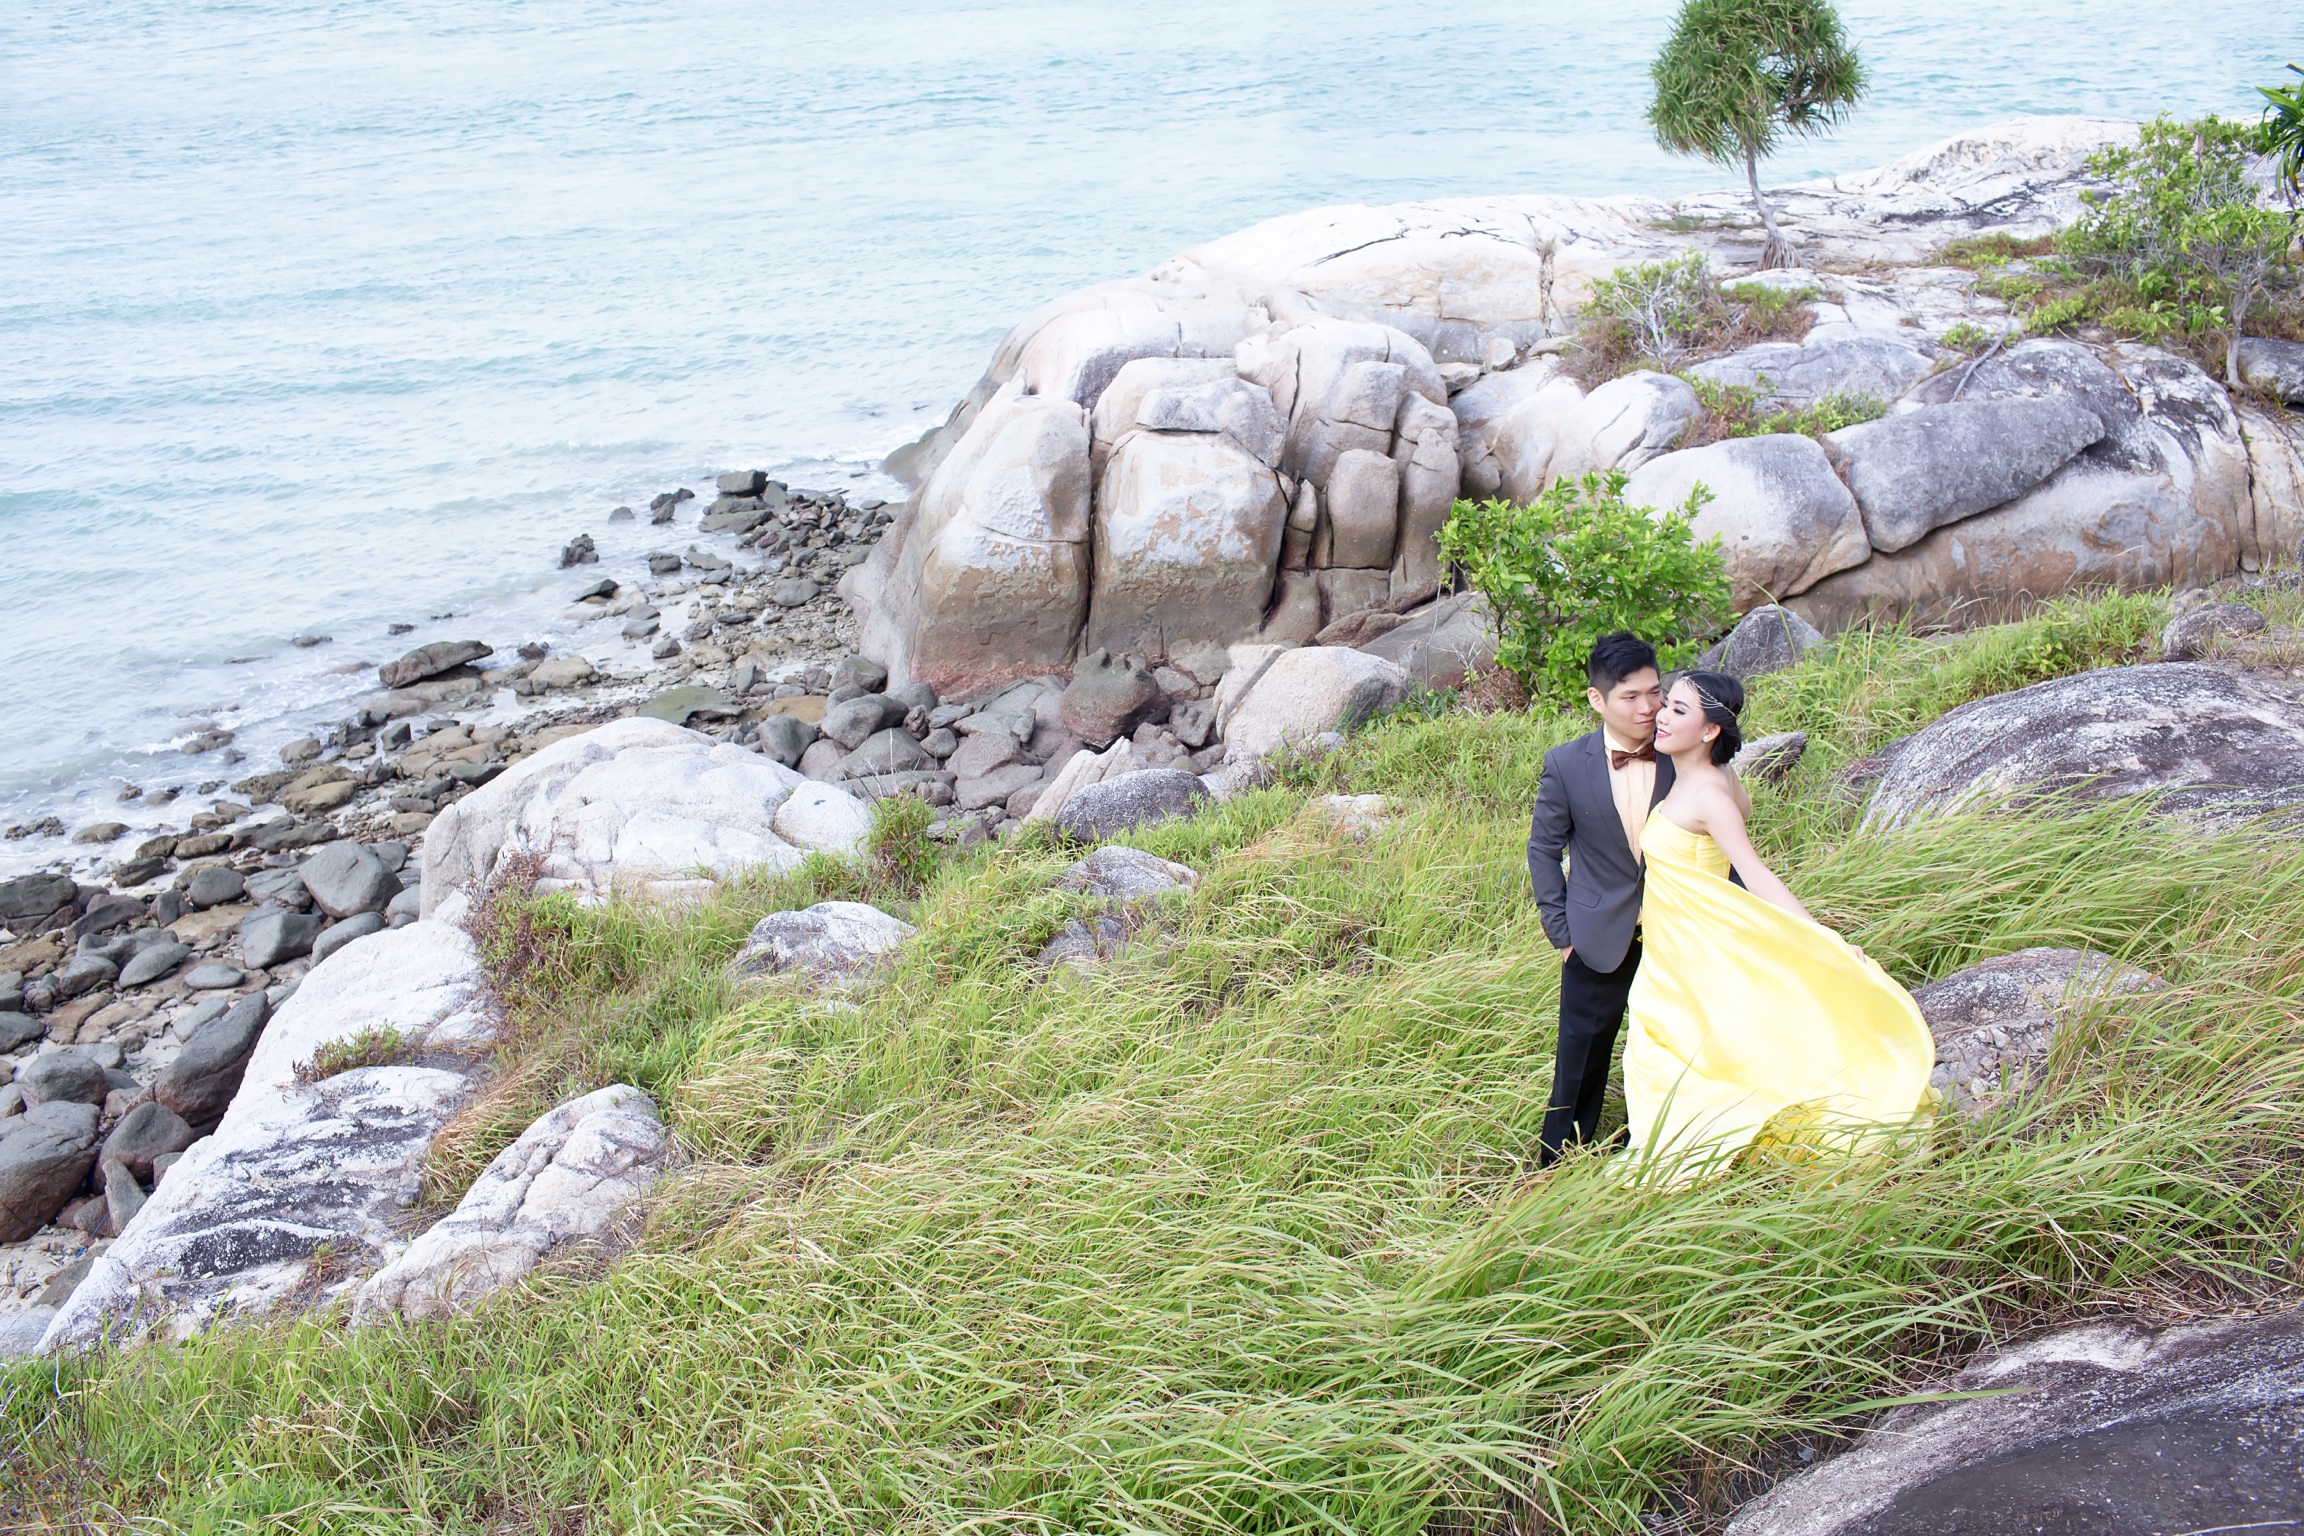 Prewedding Adi Limiartika Aldea Photography Bridestory Pulau Berhala Jambi